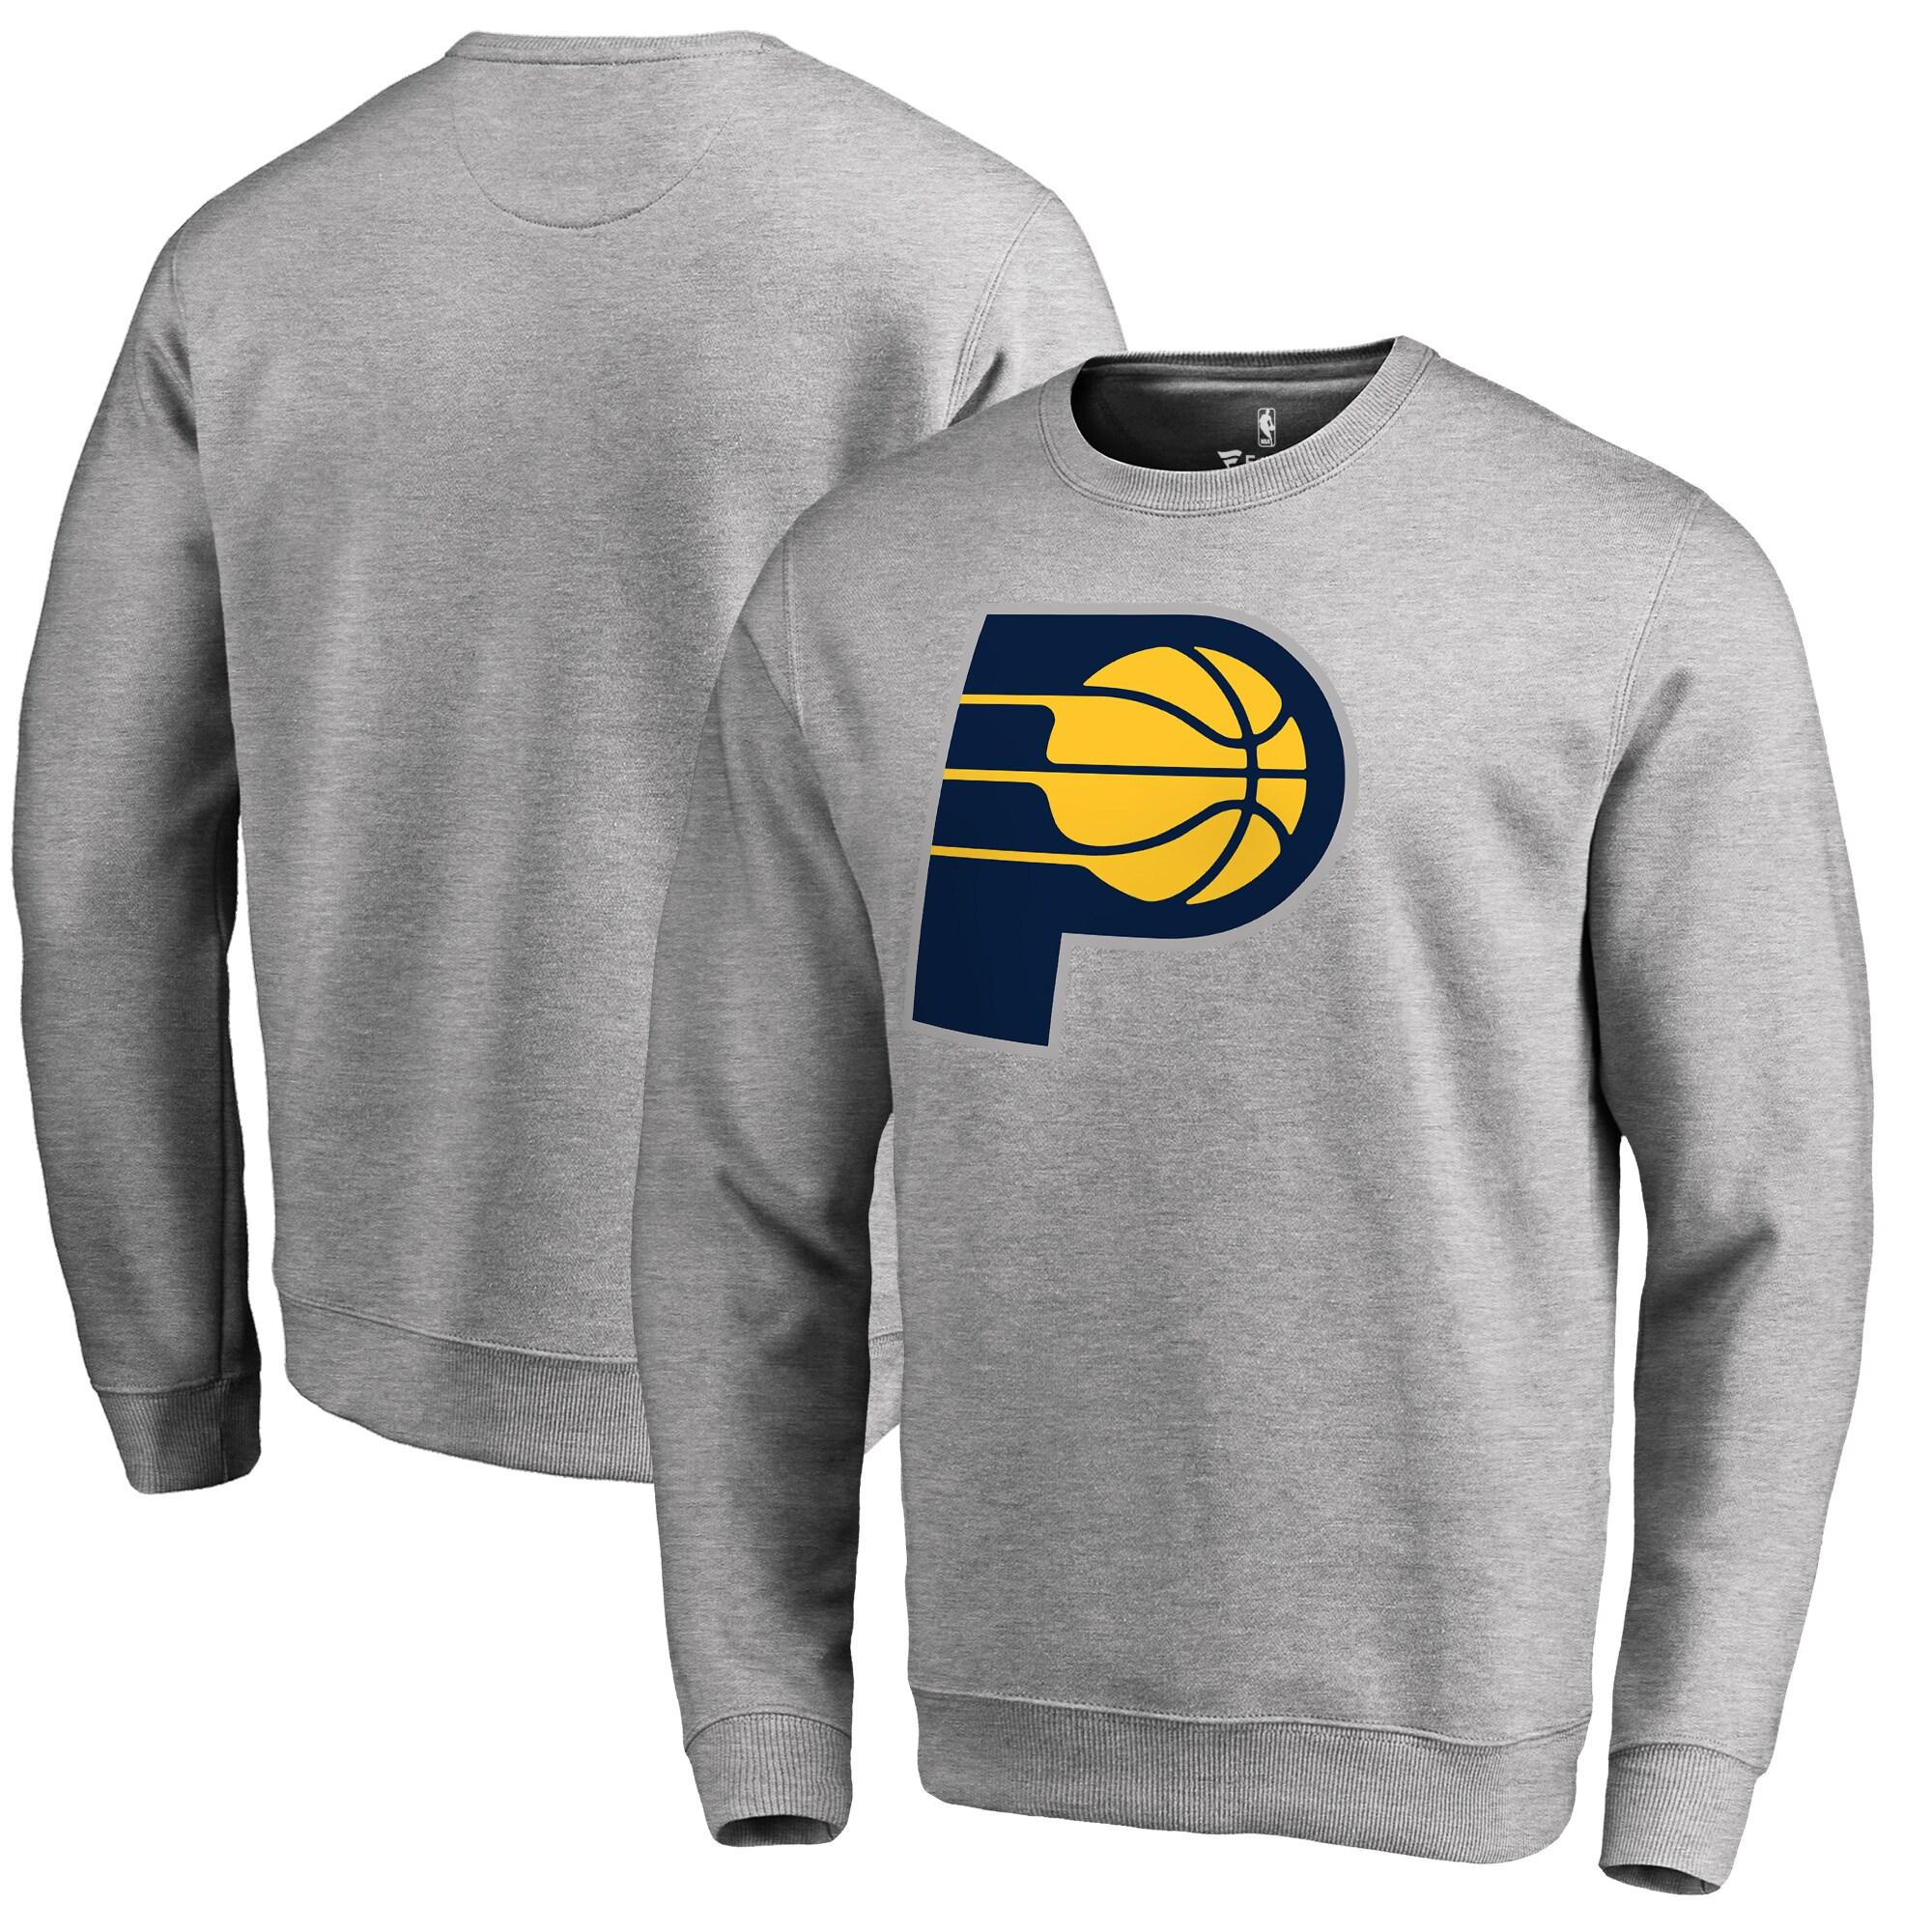 Indiana Pacers Fanatics Branded Primary Logo Sweatshirt - Heathered Gray